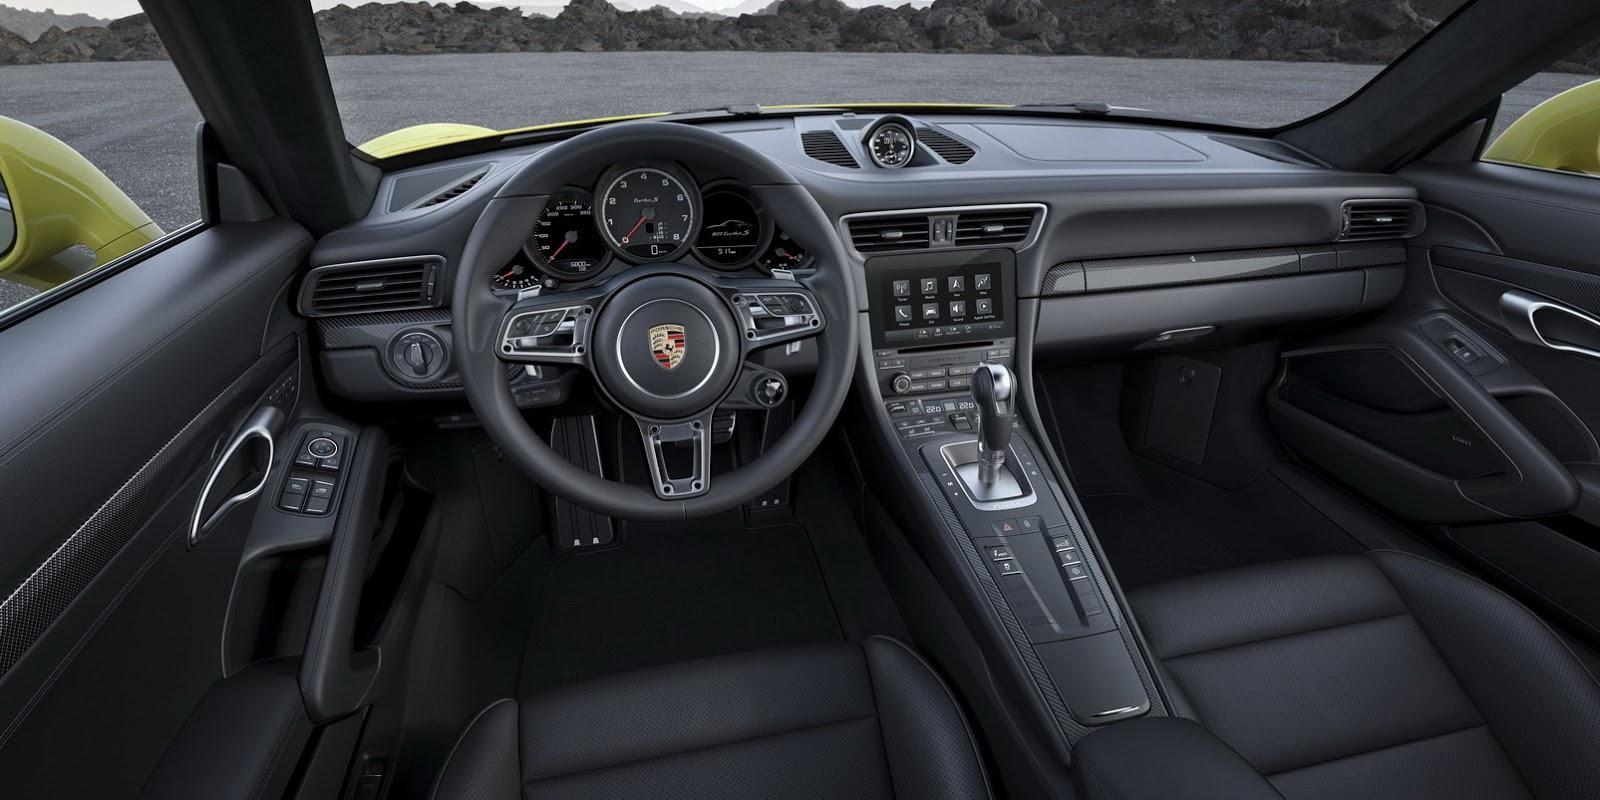 Porsche 911 Turbo 991.2